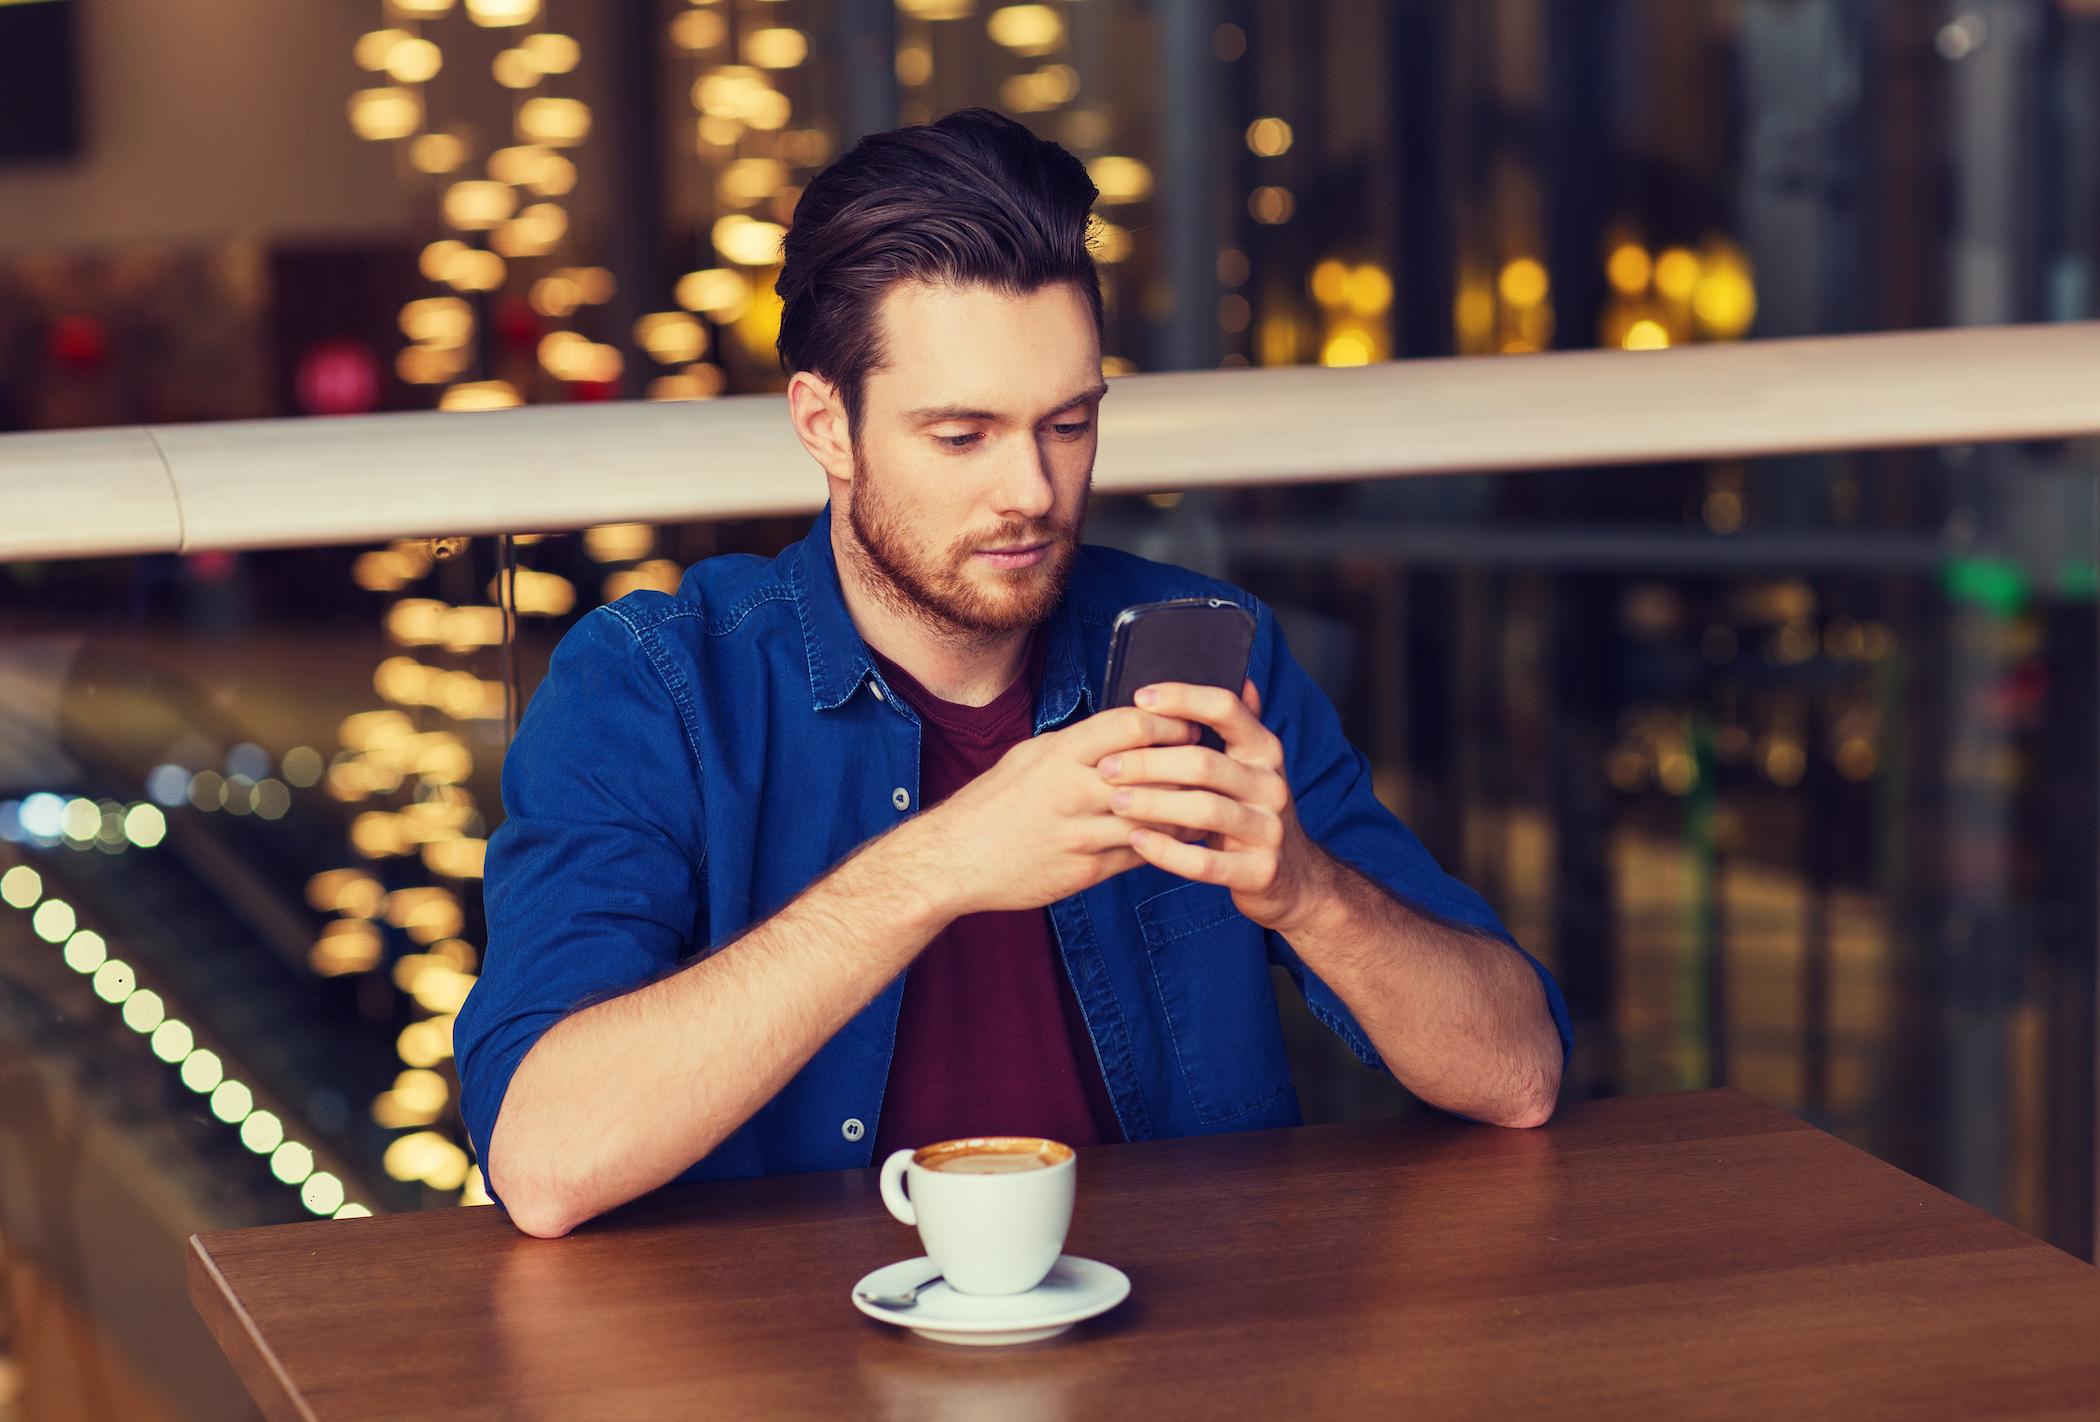 The Best Man Rolls Over His Morning Espresso In Melbourne Australia 2020